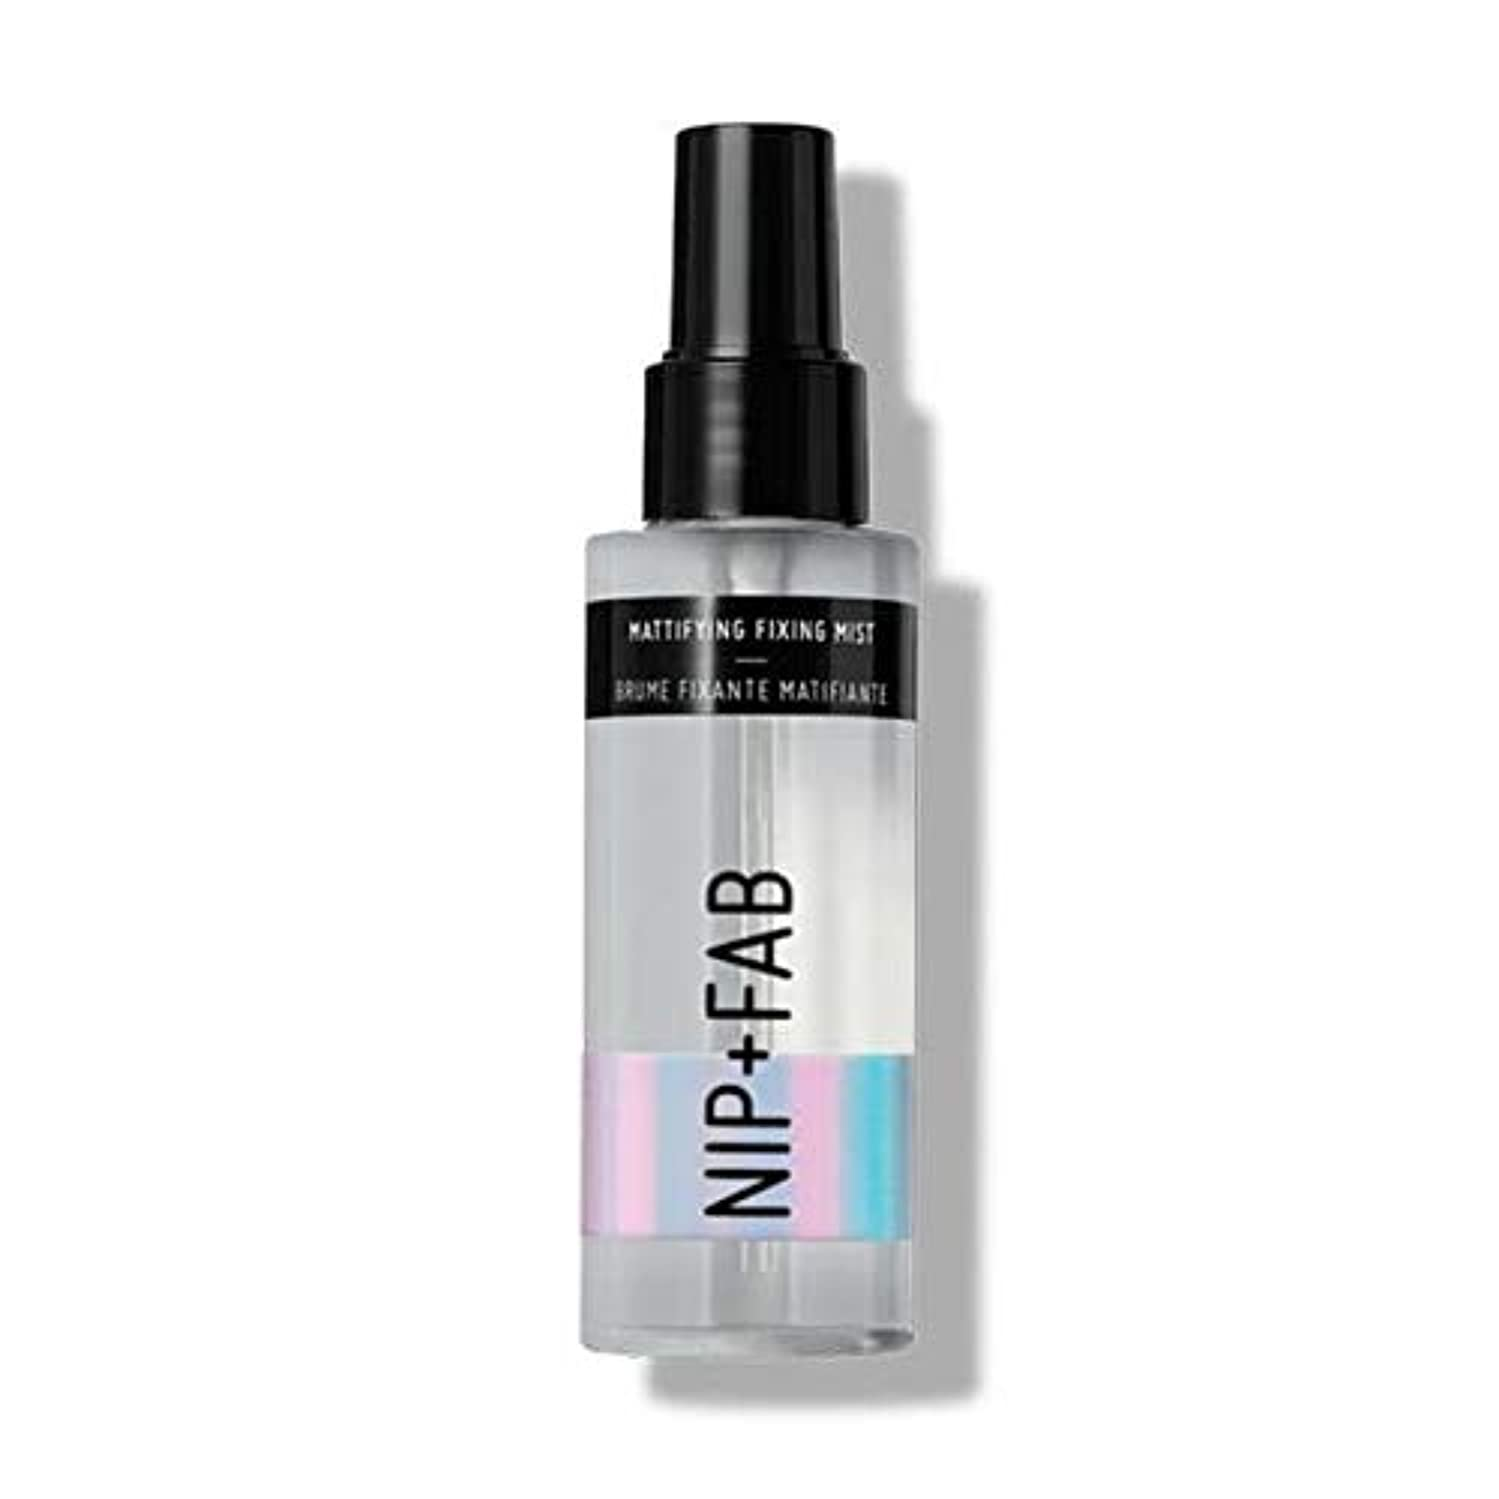 [Nip & Fab ] ミスト100ミリリットル1を固定艶消し作るFab +ニップ - NIP+FAB Make Up Mattifying Fixing Mist 100ml 1 [並行輸入品]